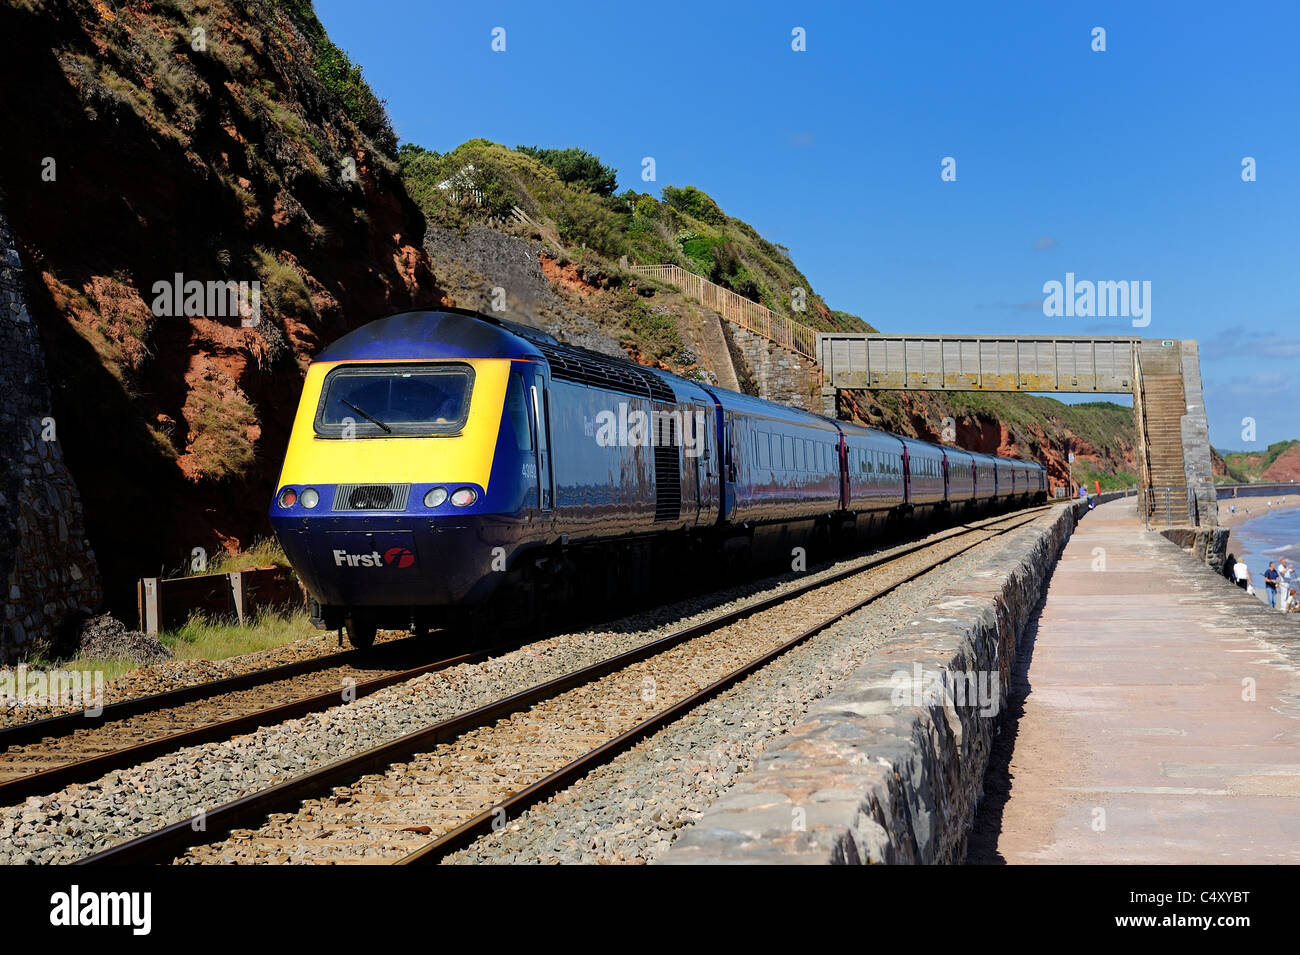 An afternoon express train heading towards Dawlish Devon england uk - Stock Image